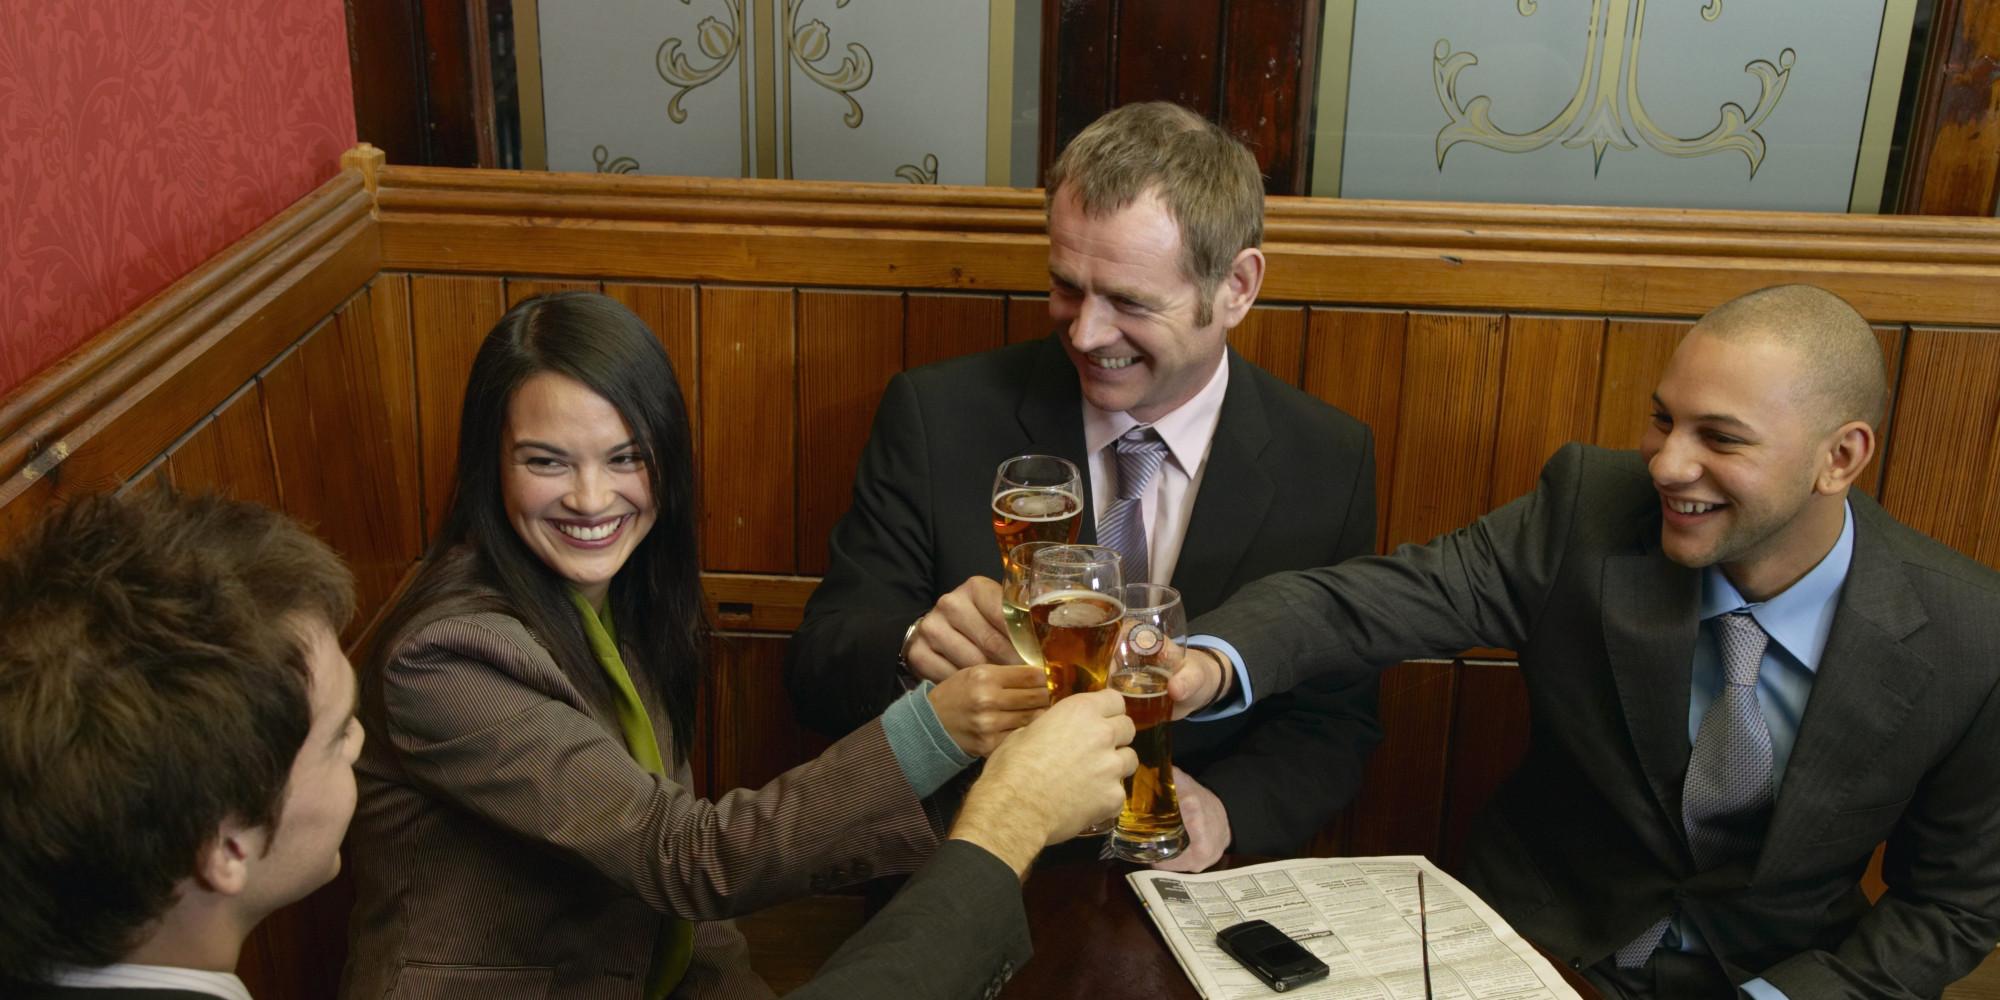 5 social blunders people make at bars huffpost